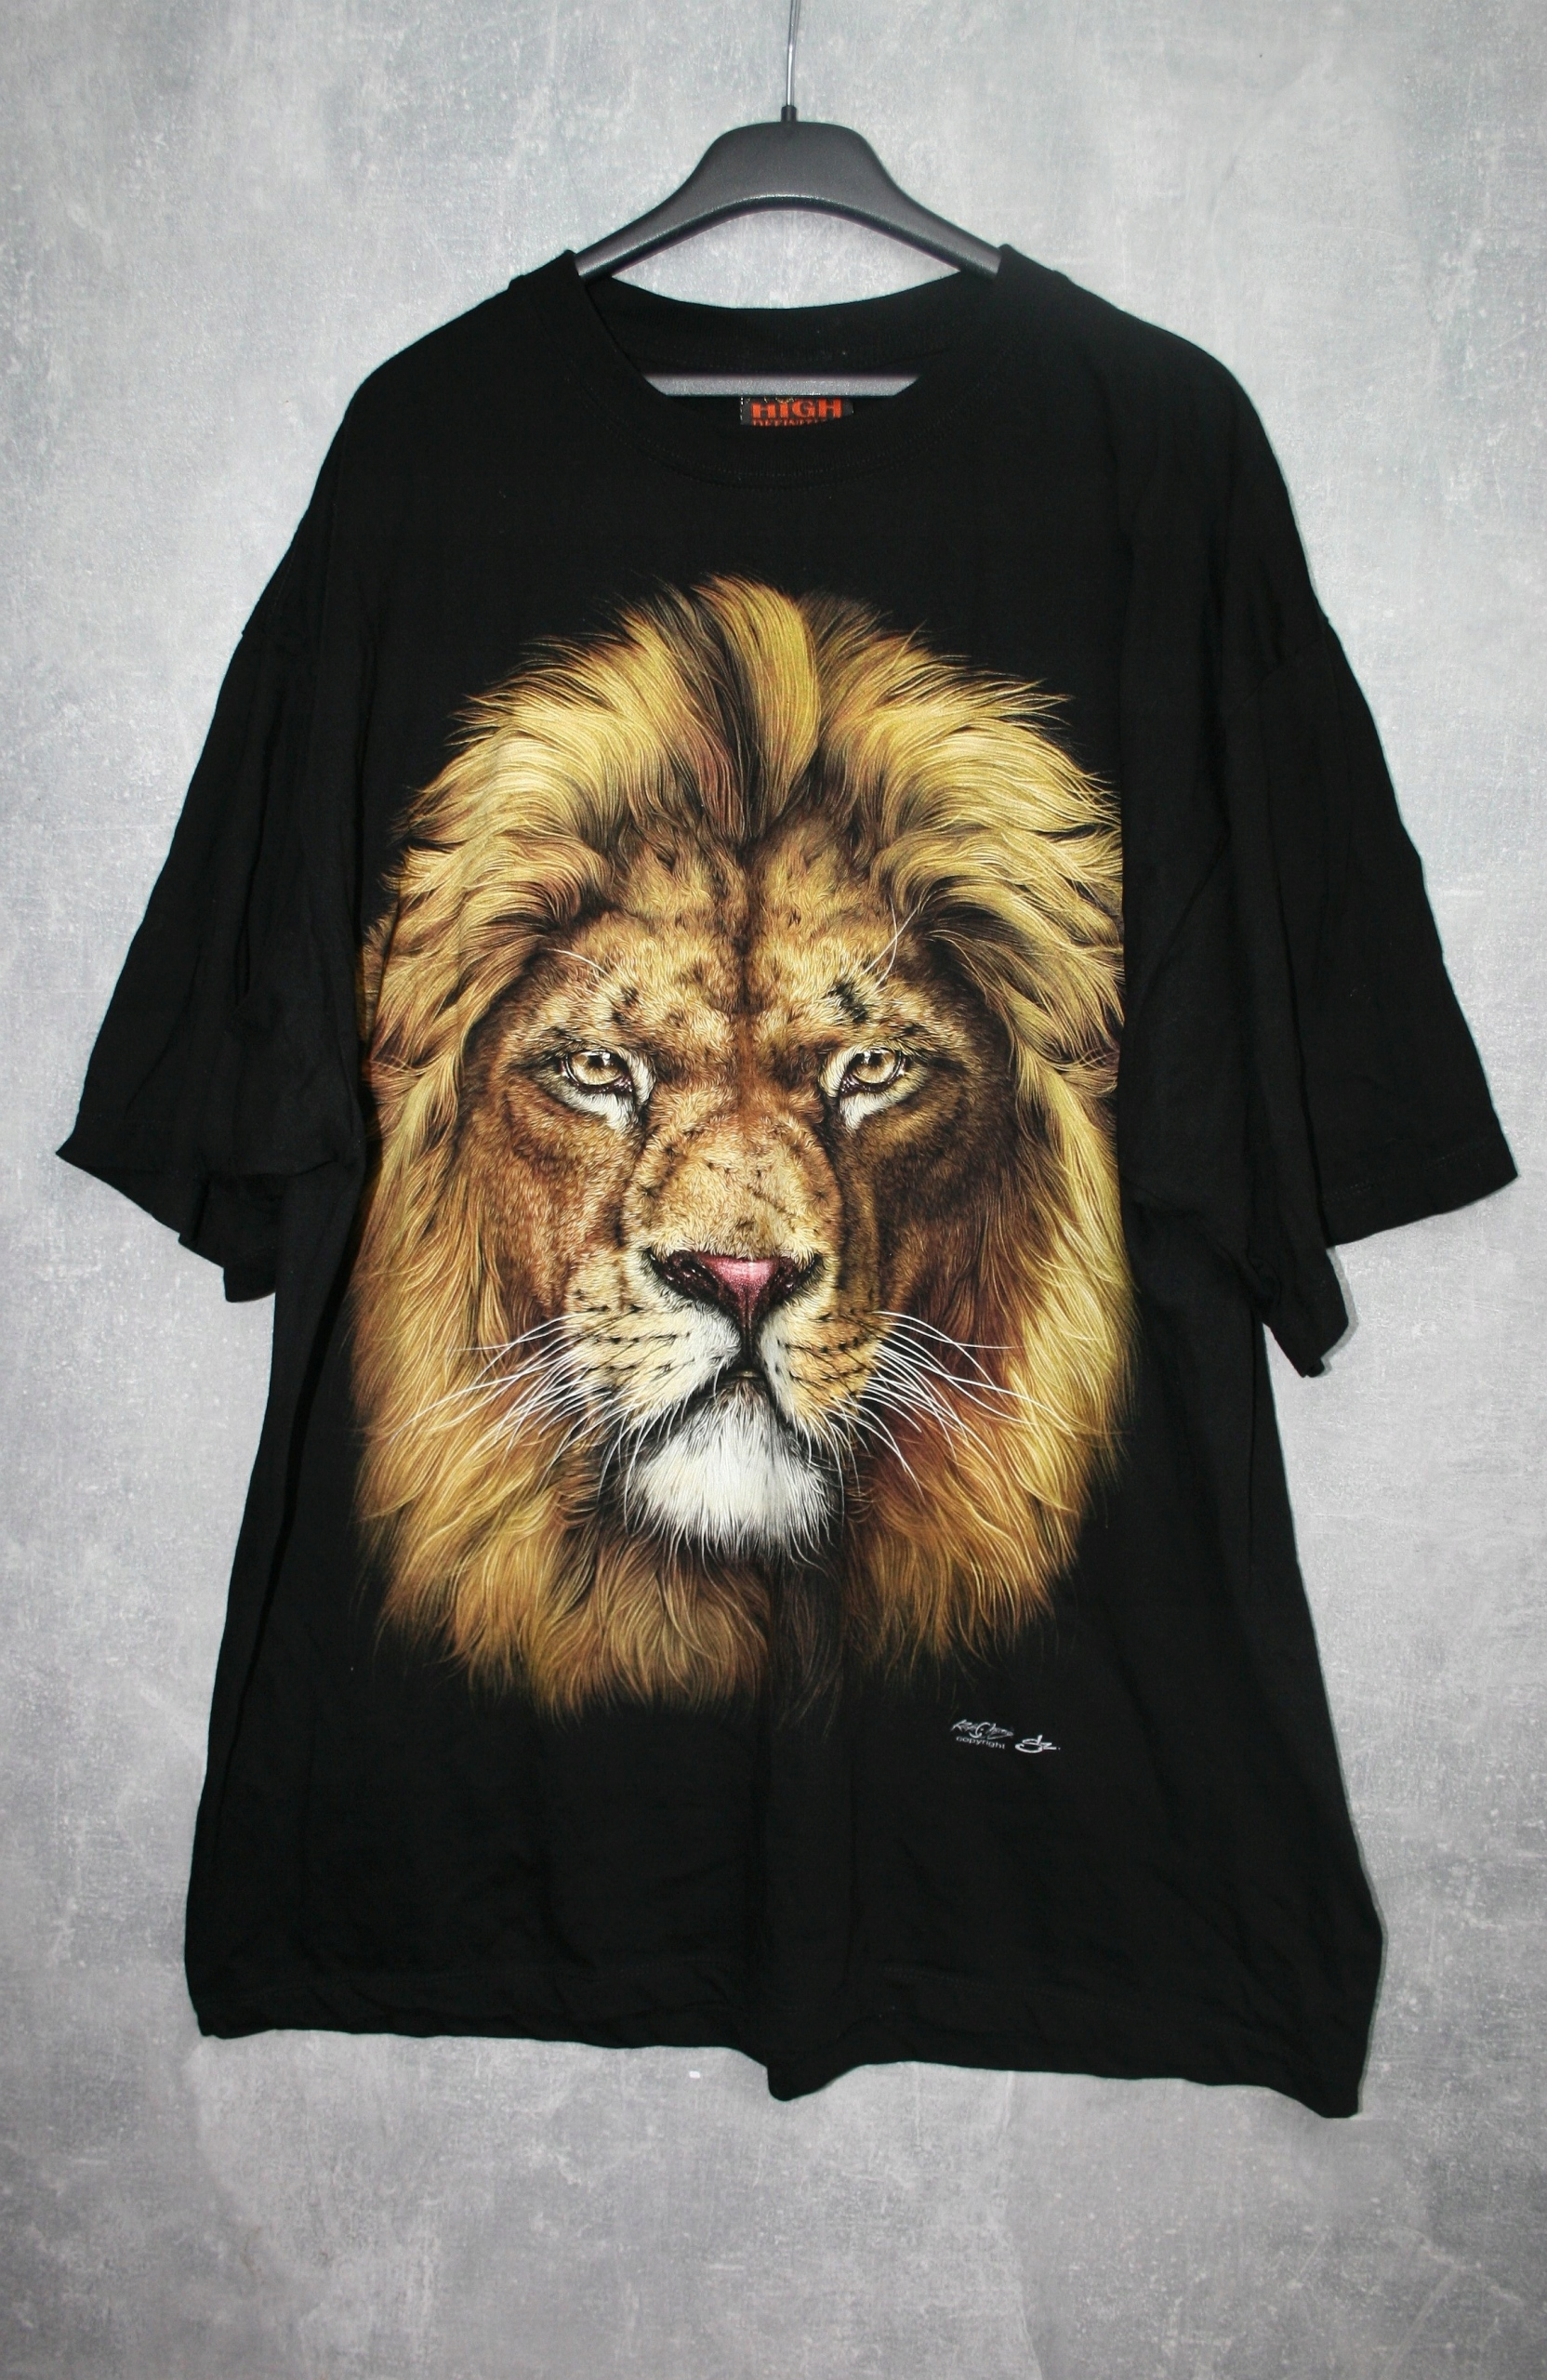 T-shirt koszulka męska XXL LEW oryginalna